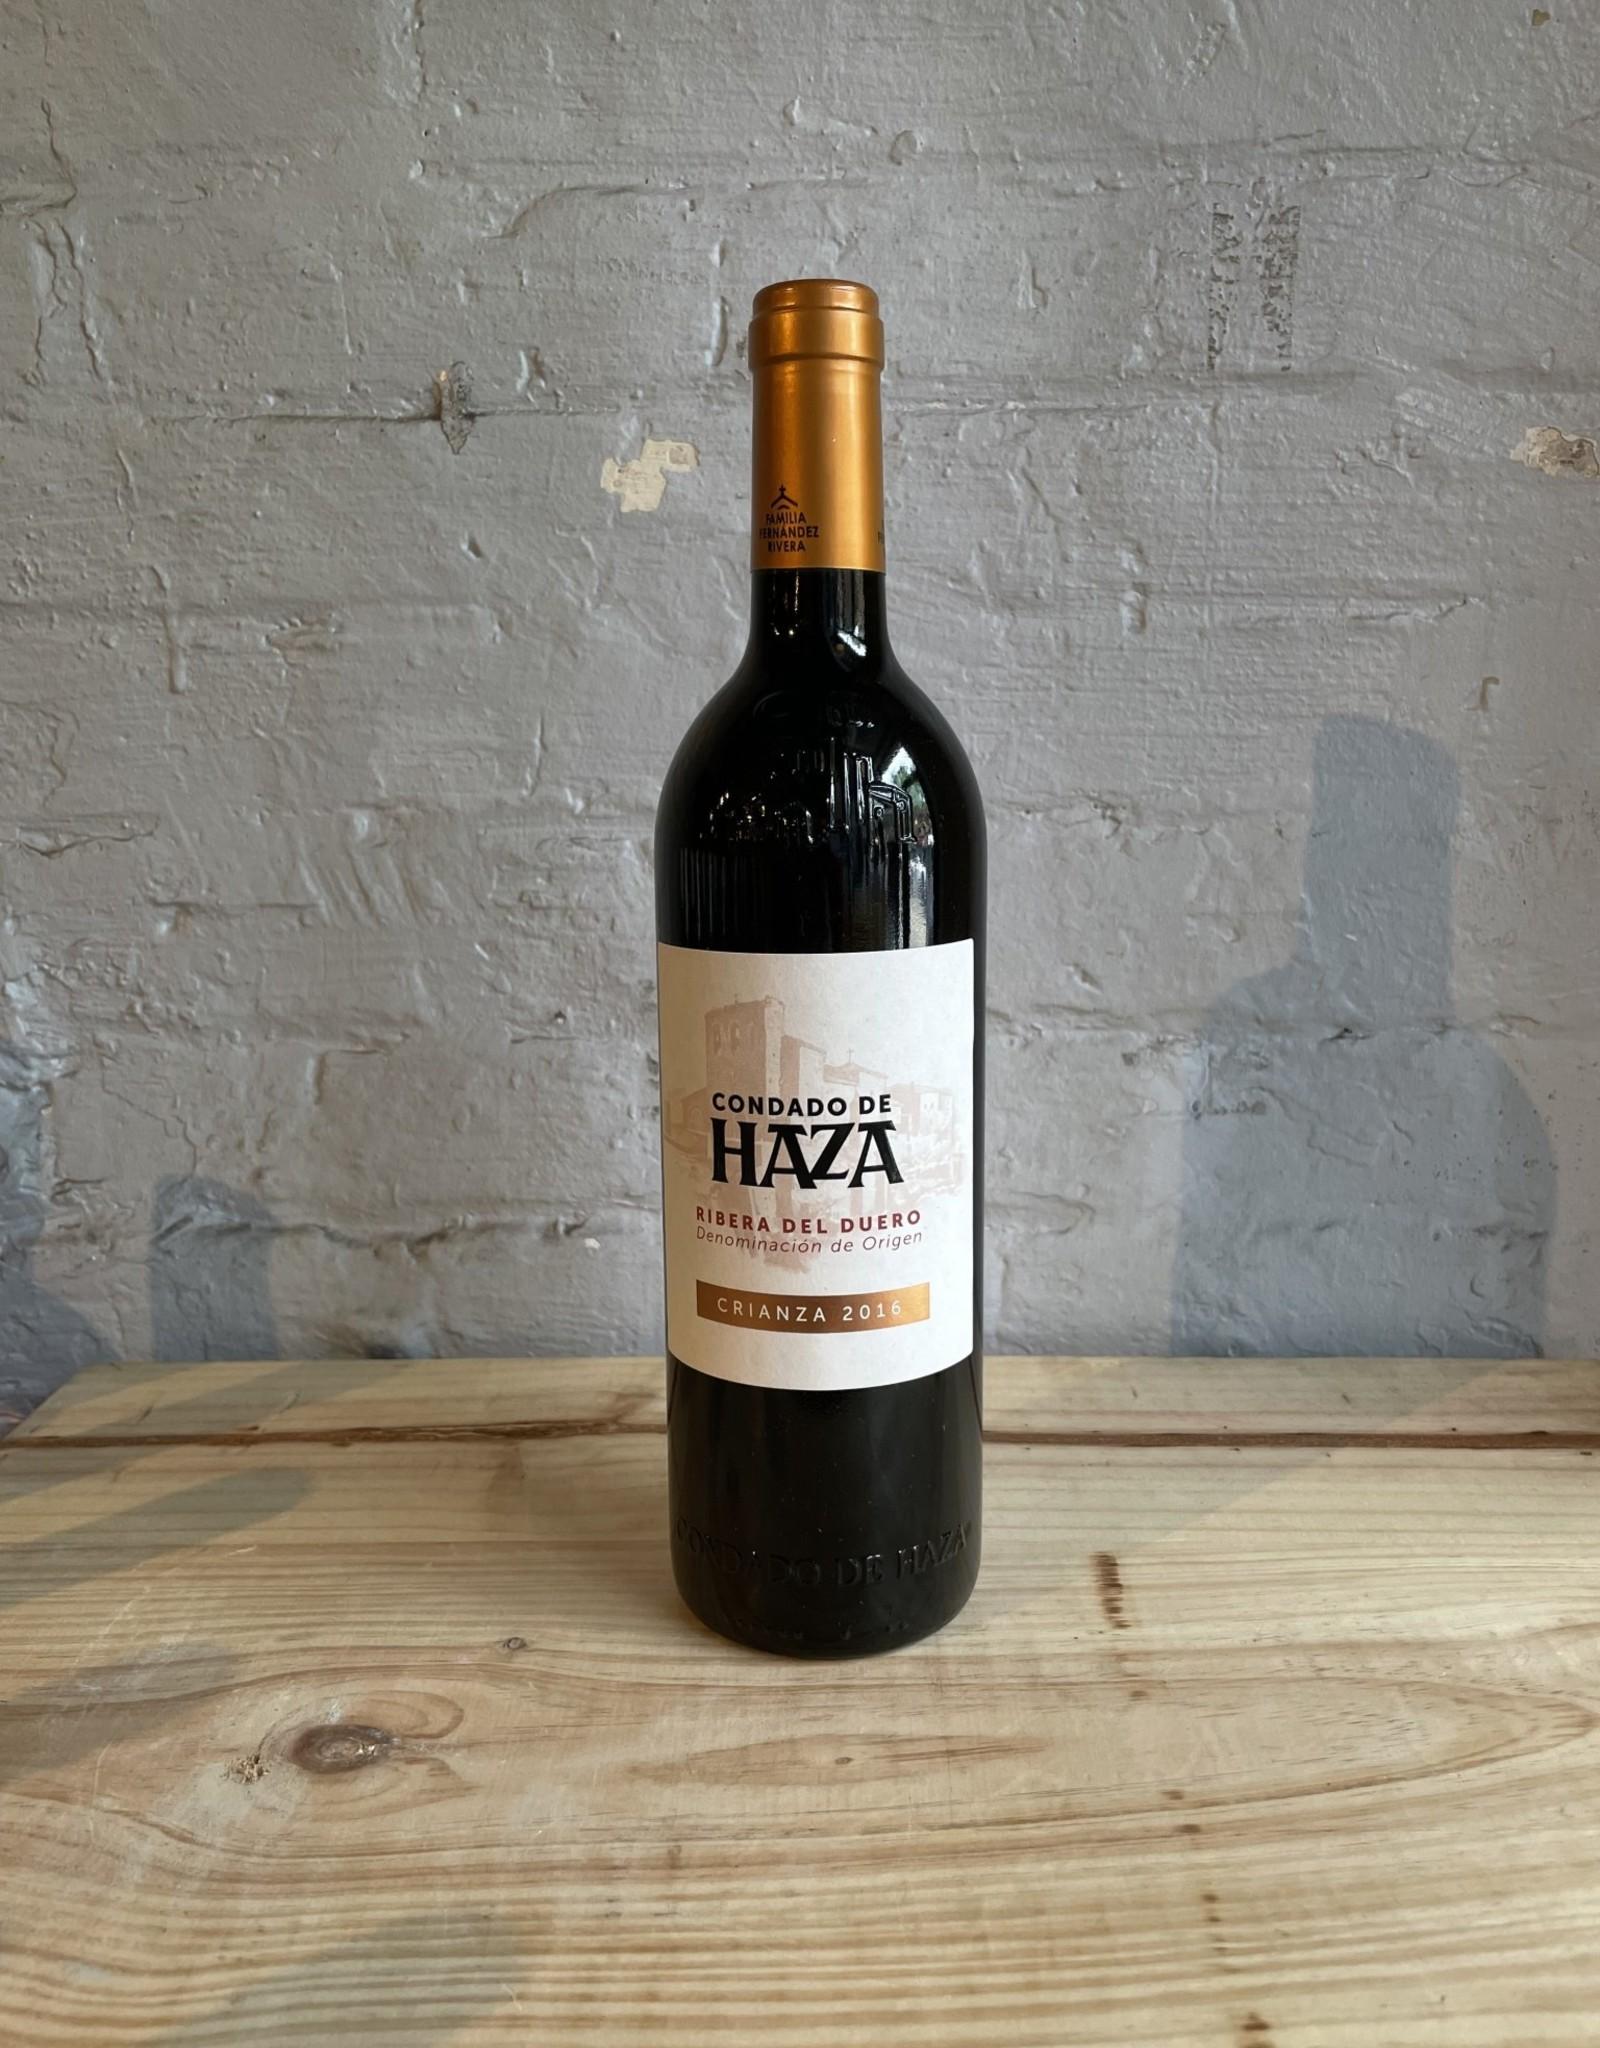 Wine 2016 Bodegas Condado de Haza Crianza - Ribera del Duero, Spain (750ml)